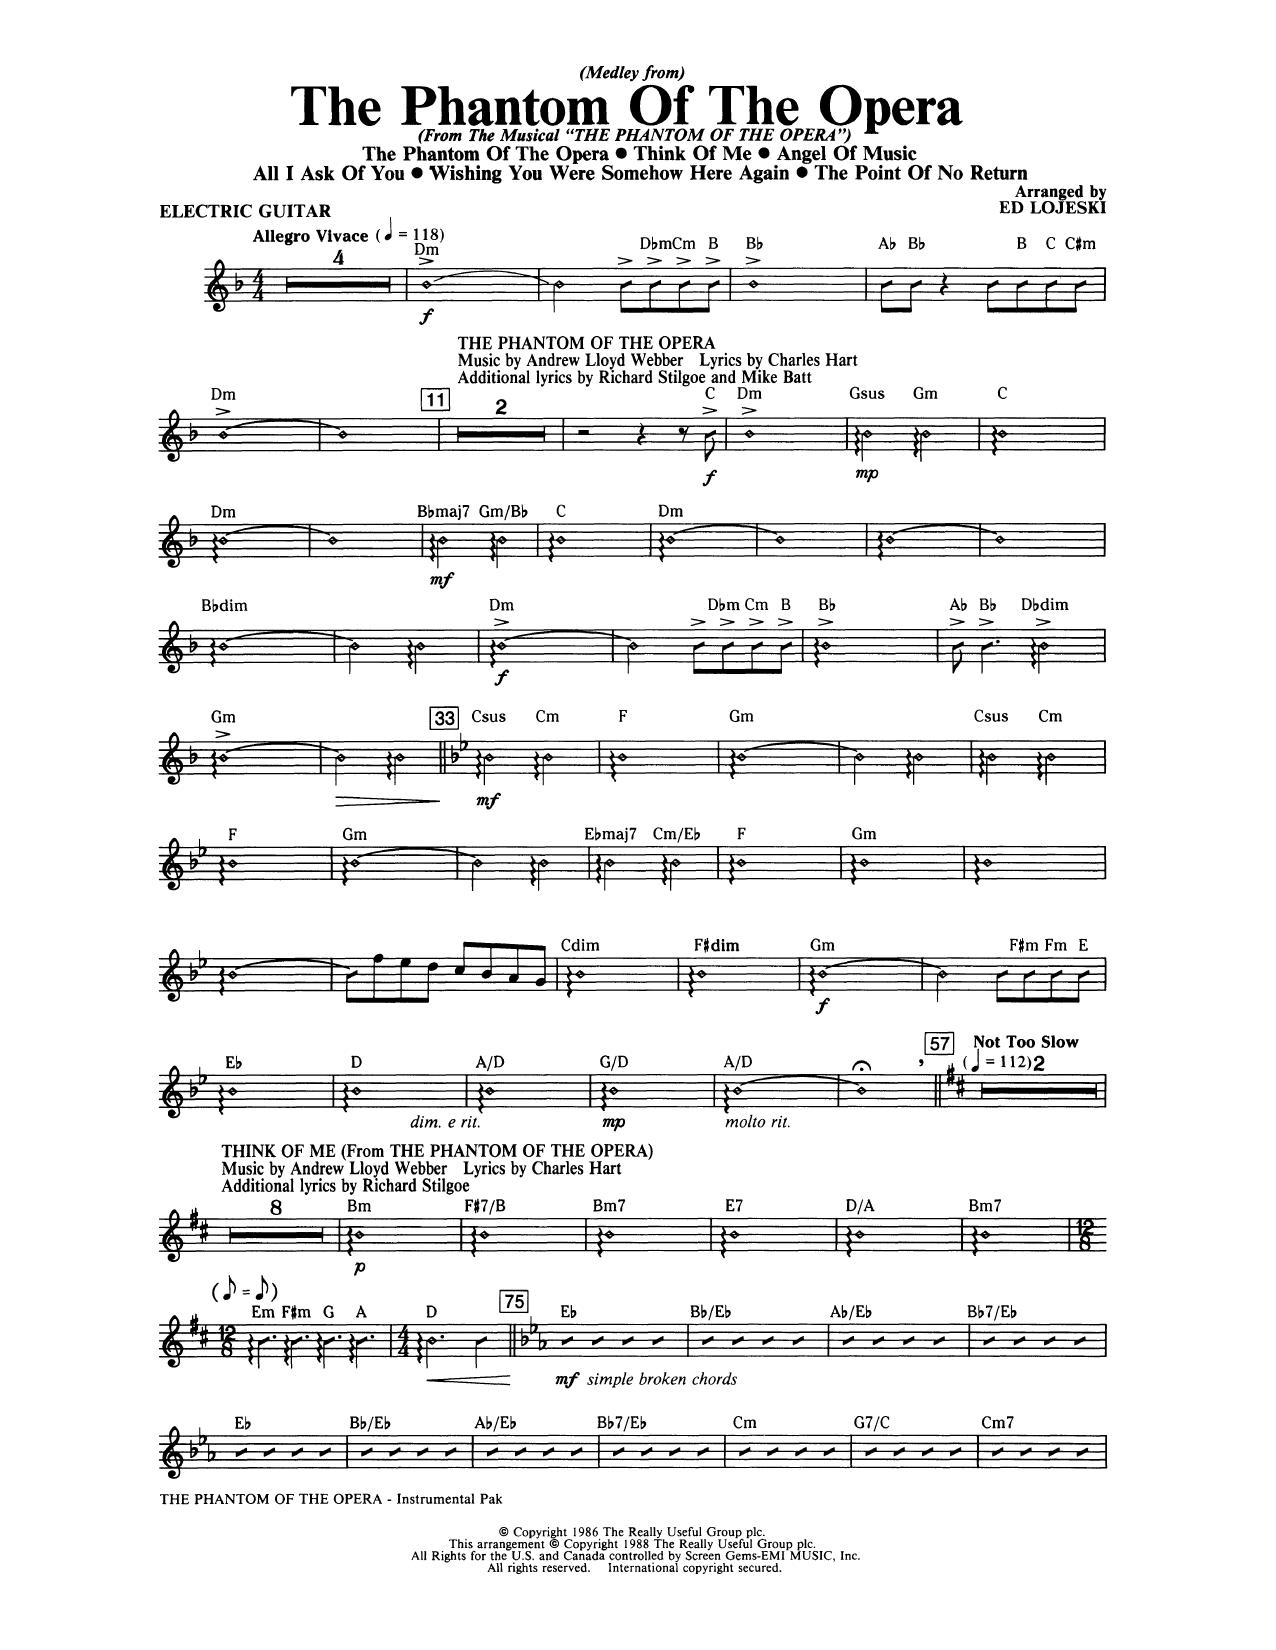 Phantom Of The Opera Medley From Instrumental Pak